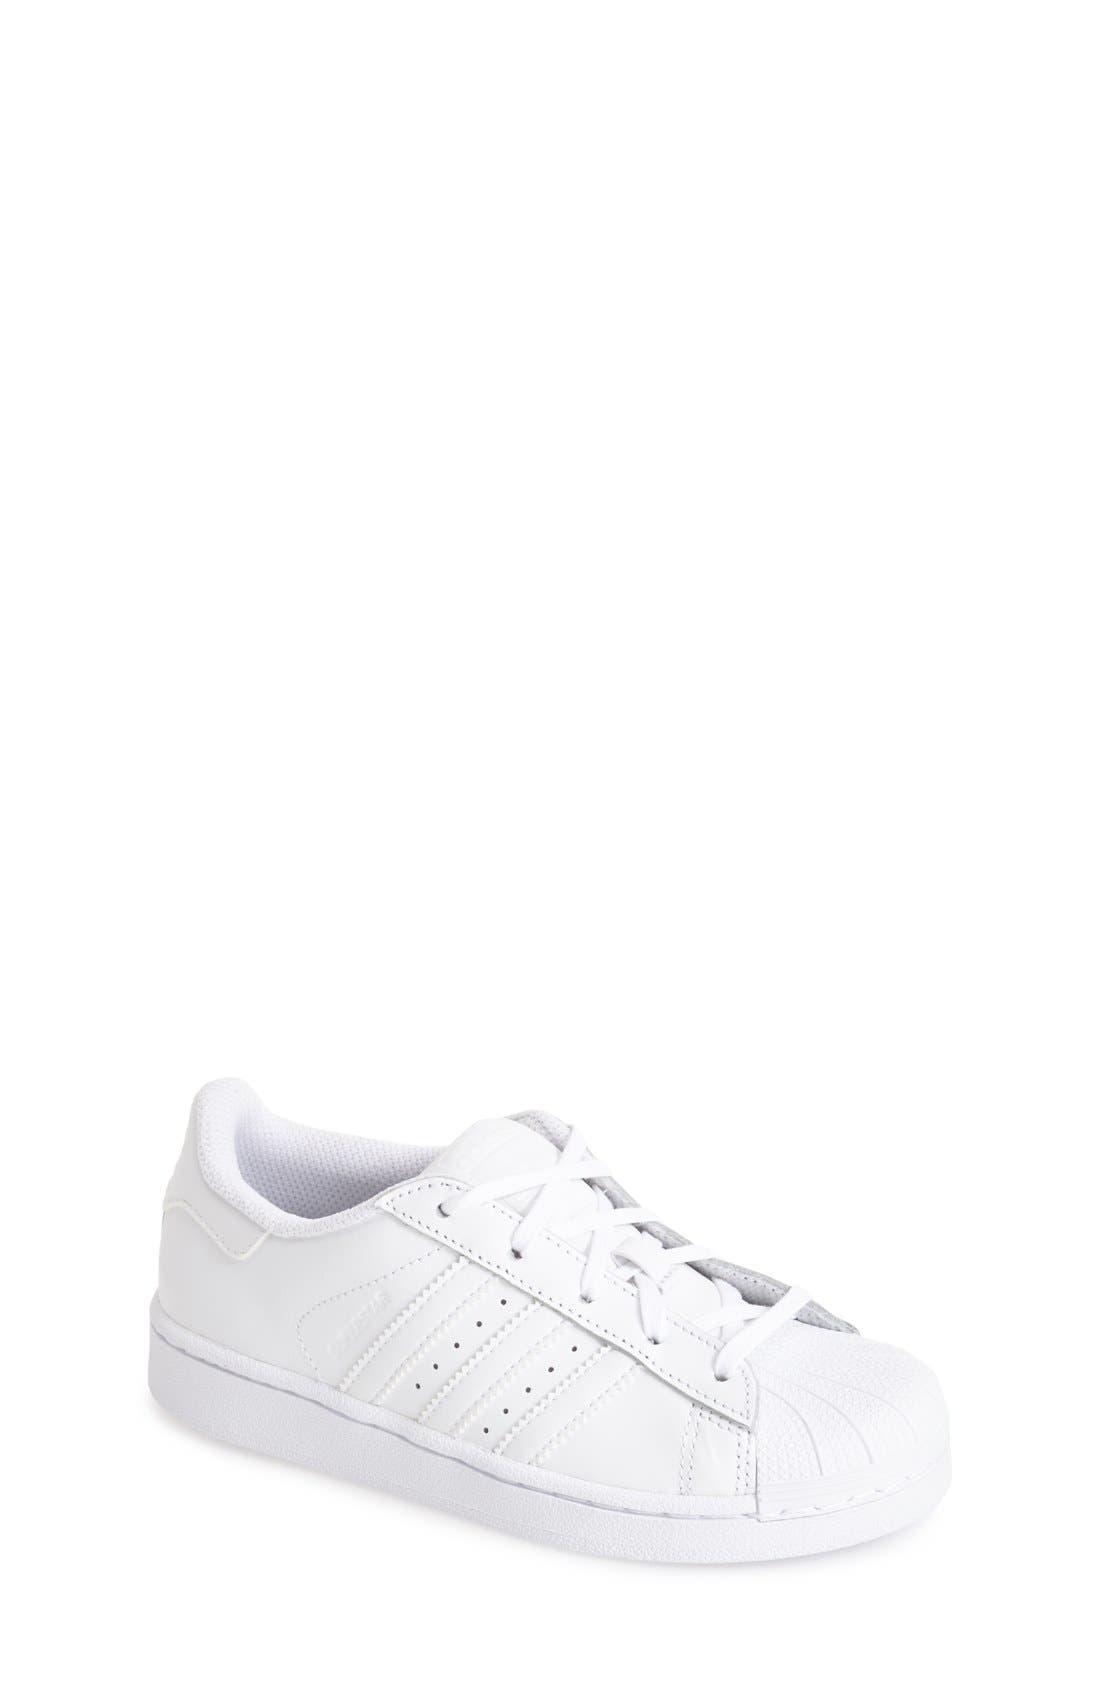 Alternate Image 1 Selected - adidas 'Superstar' Sneaker (Toddler & Little Kid)